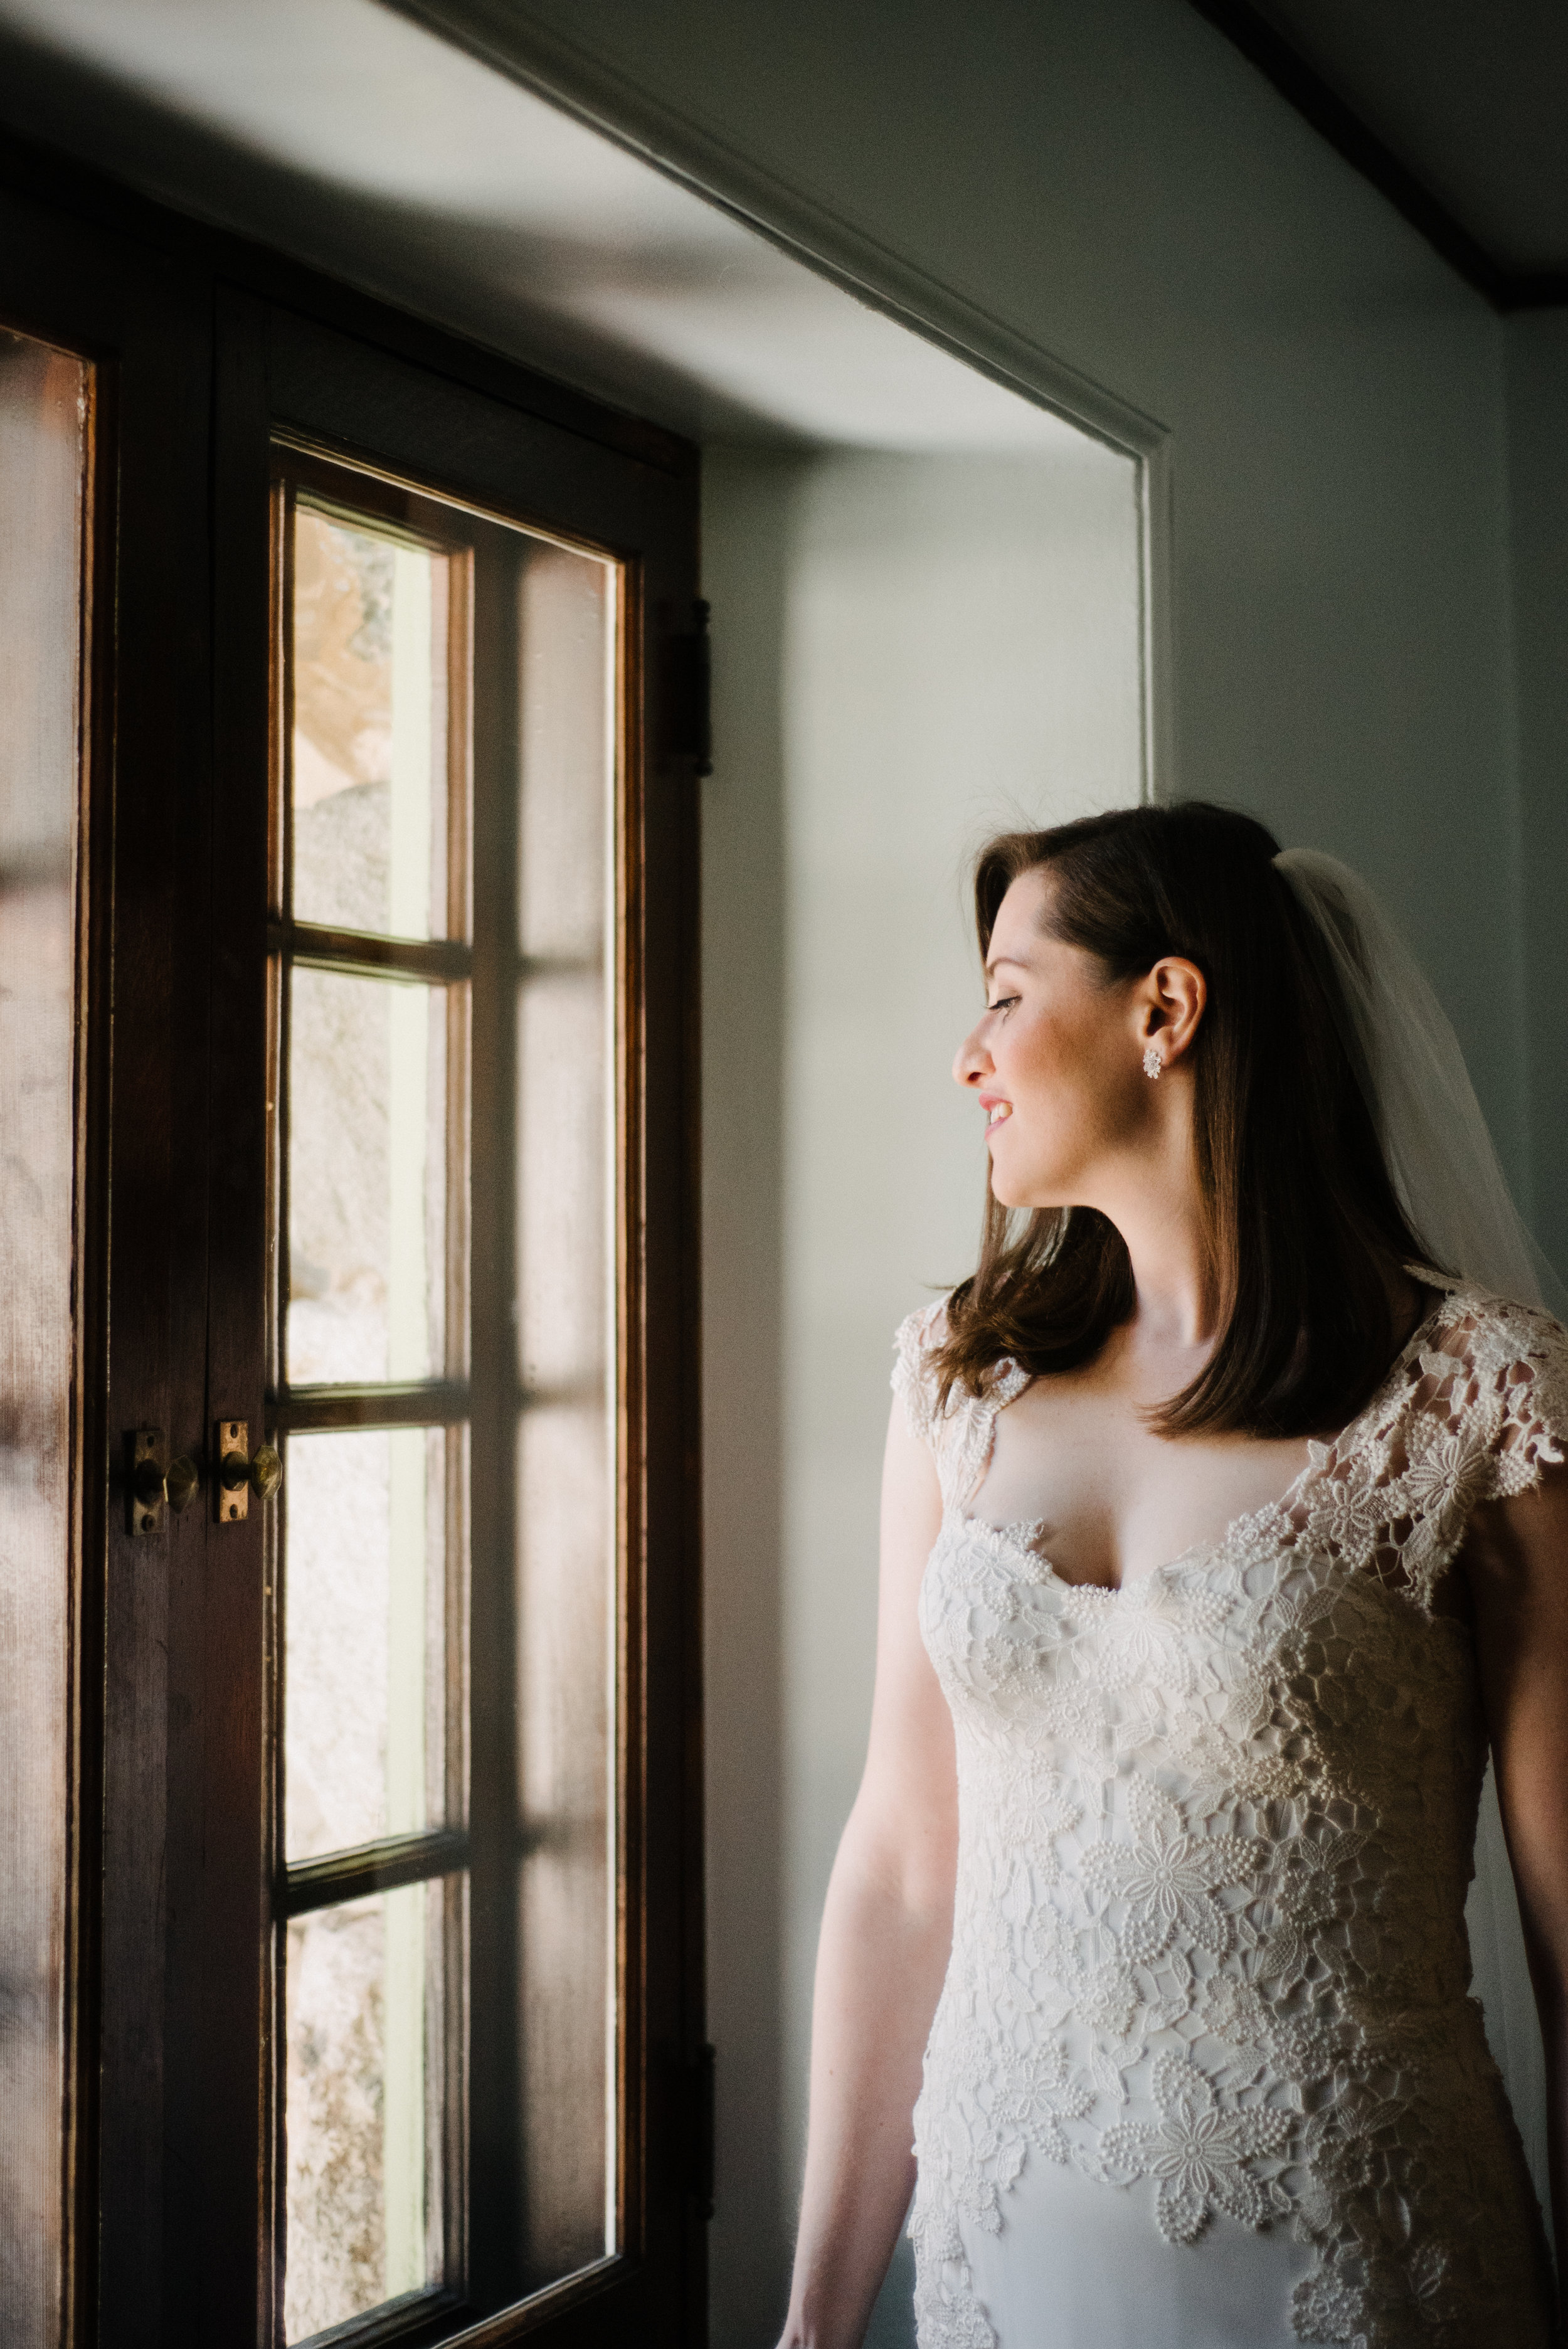 03_north shore massachusetts willowdale wedding photographer fifty one hale-1-8.jpg